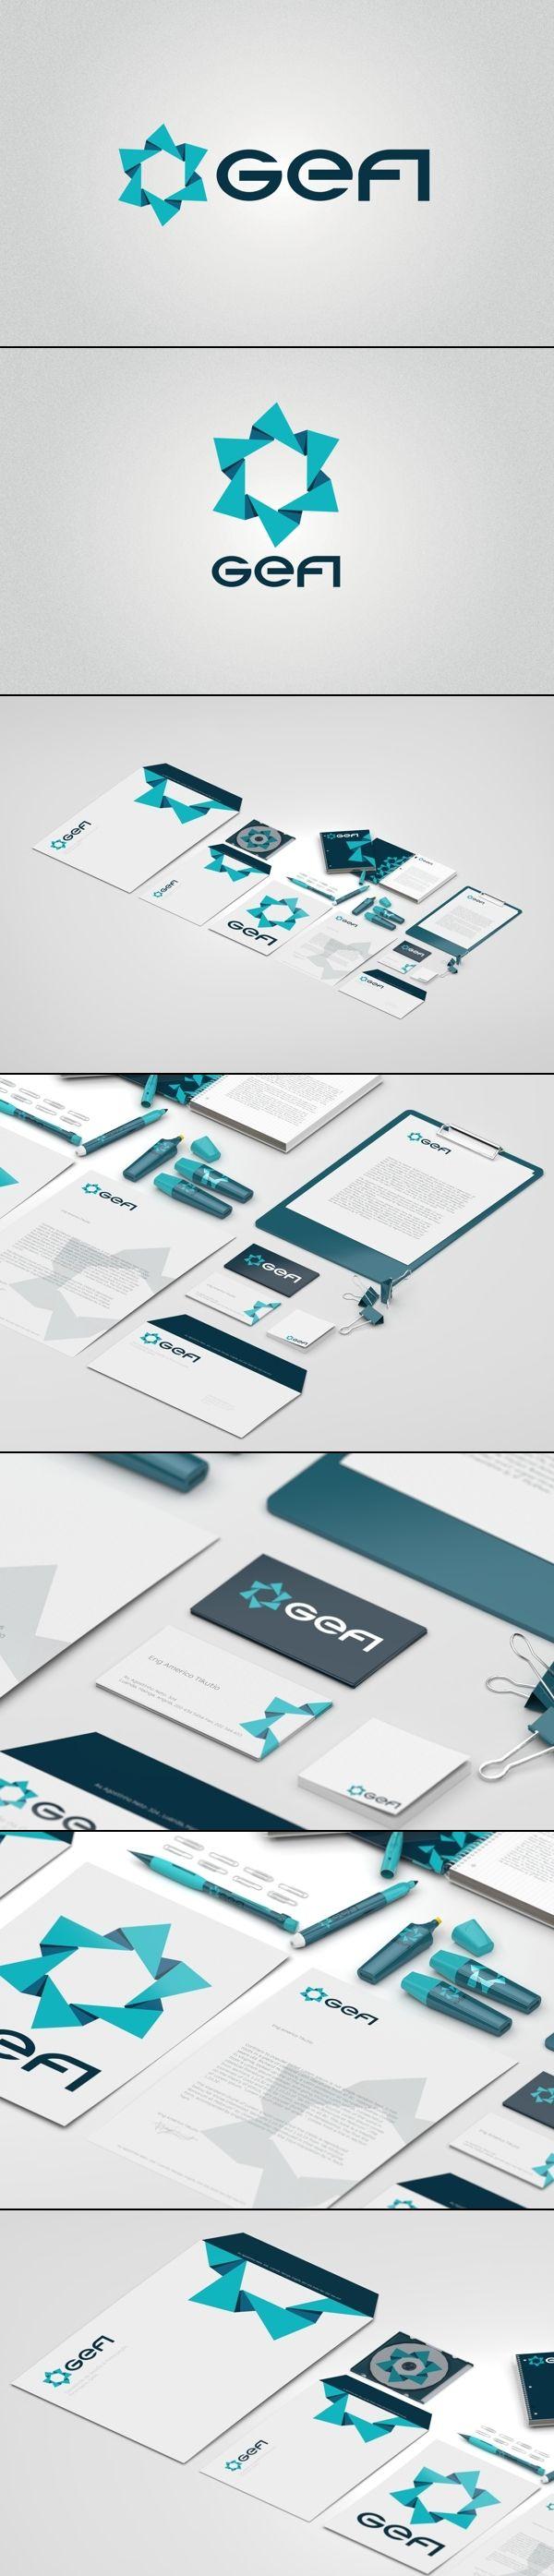 identity / GEFI Rebranding